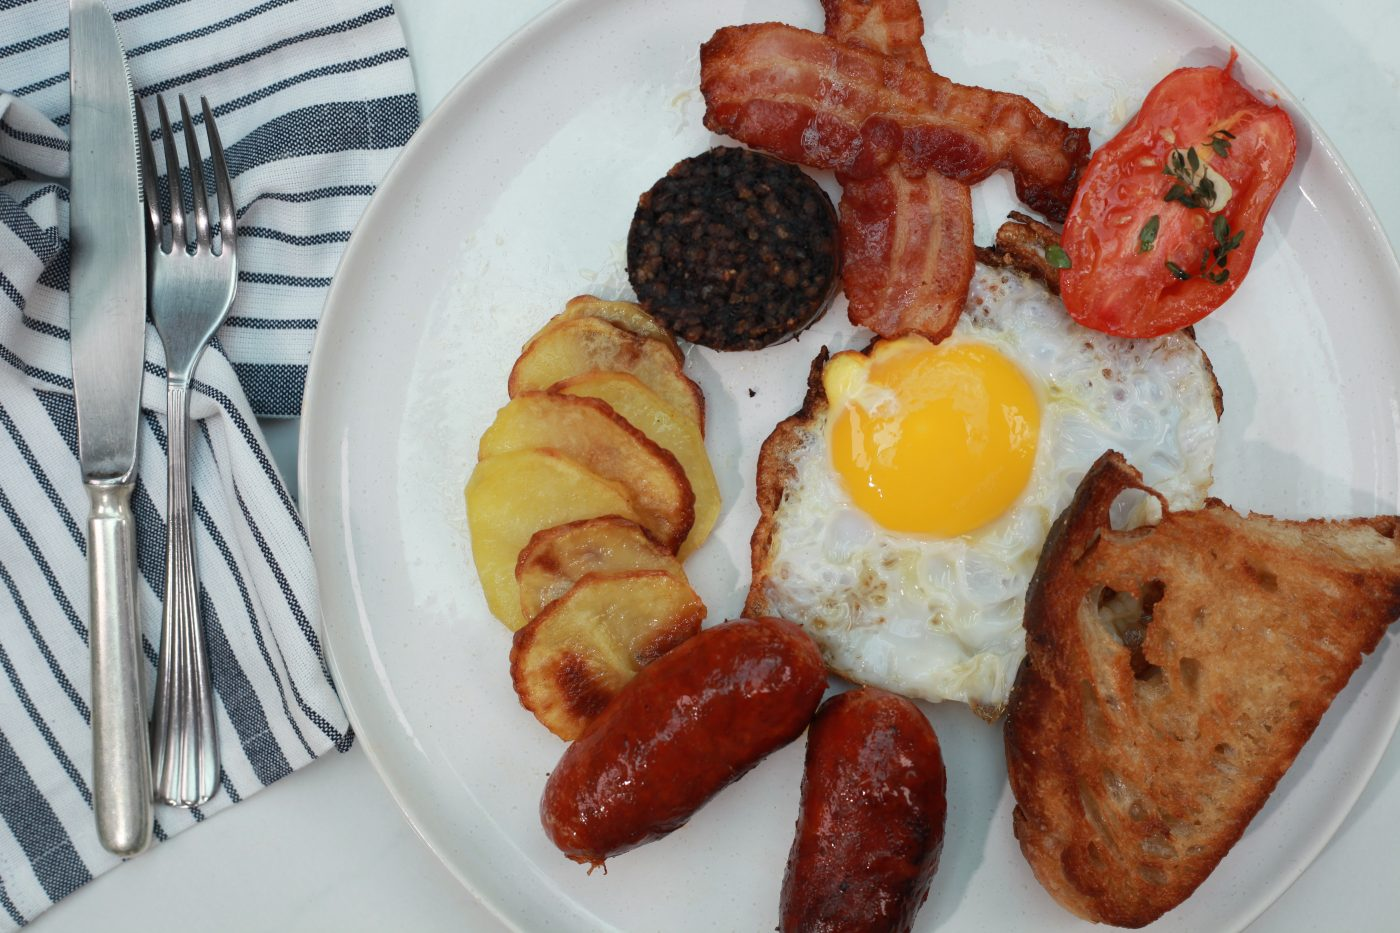 Spanish Fried Breakfast